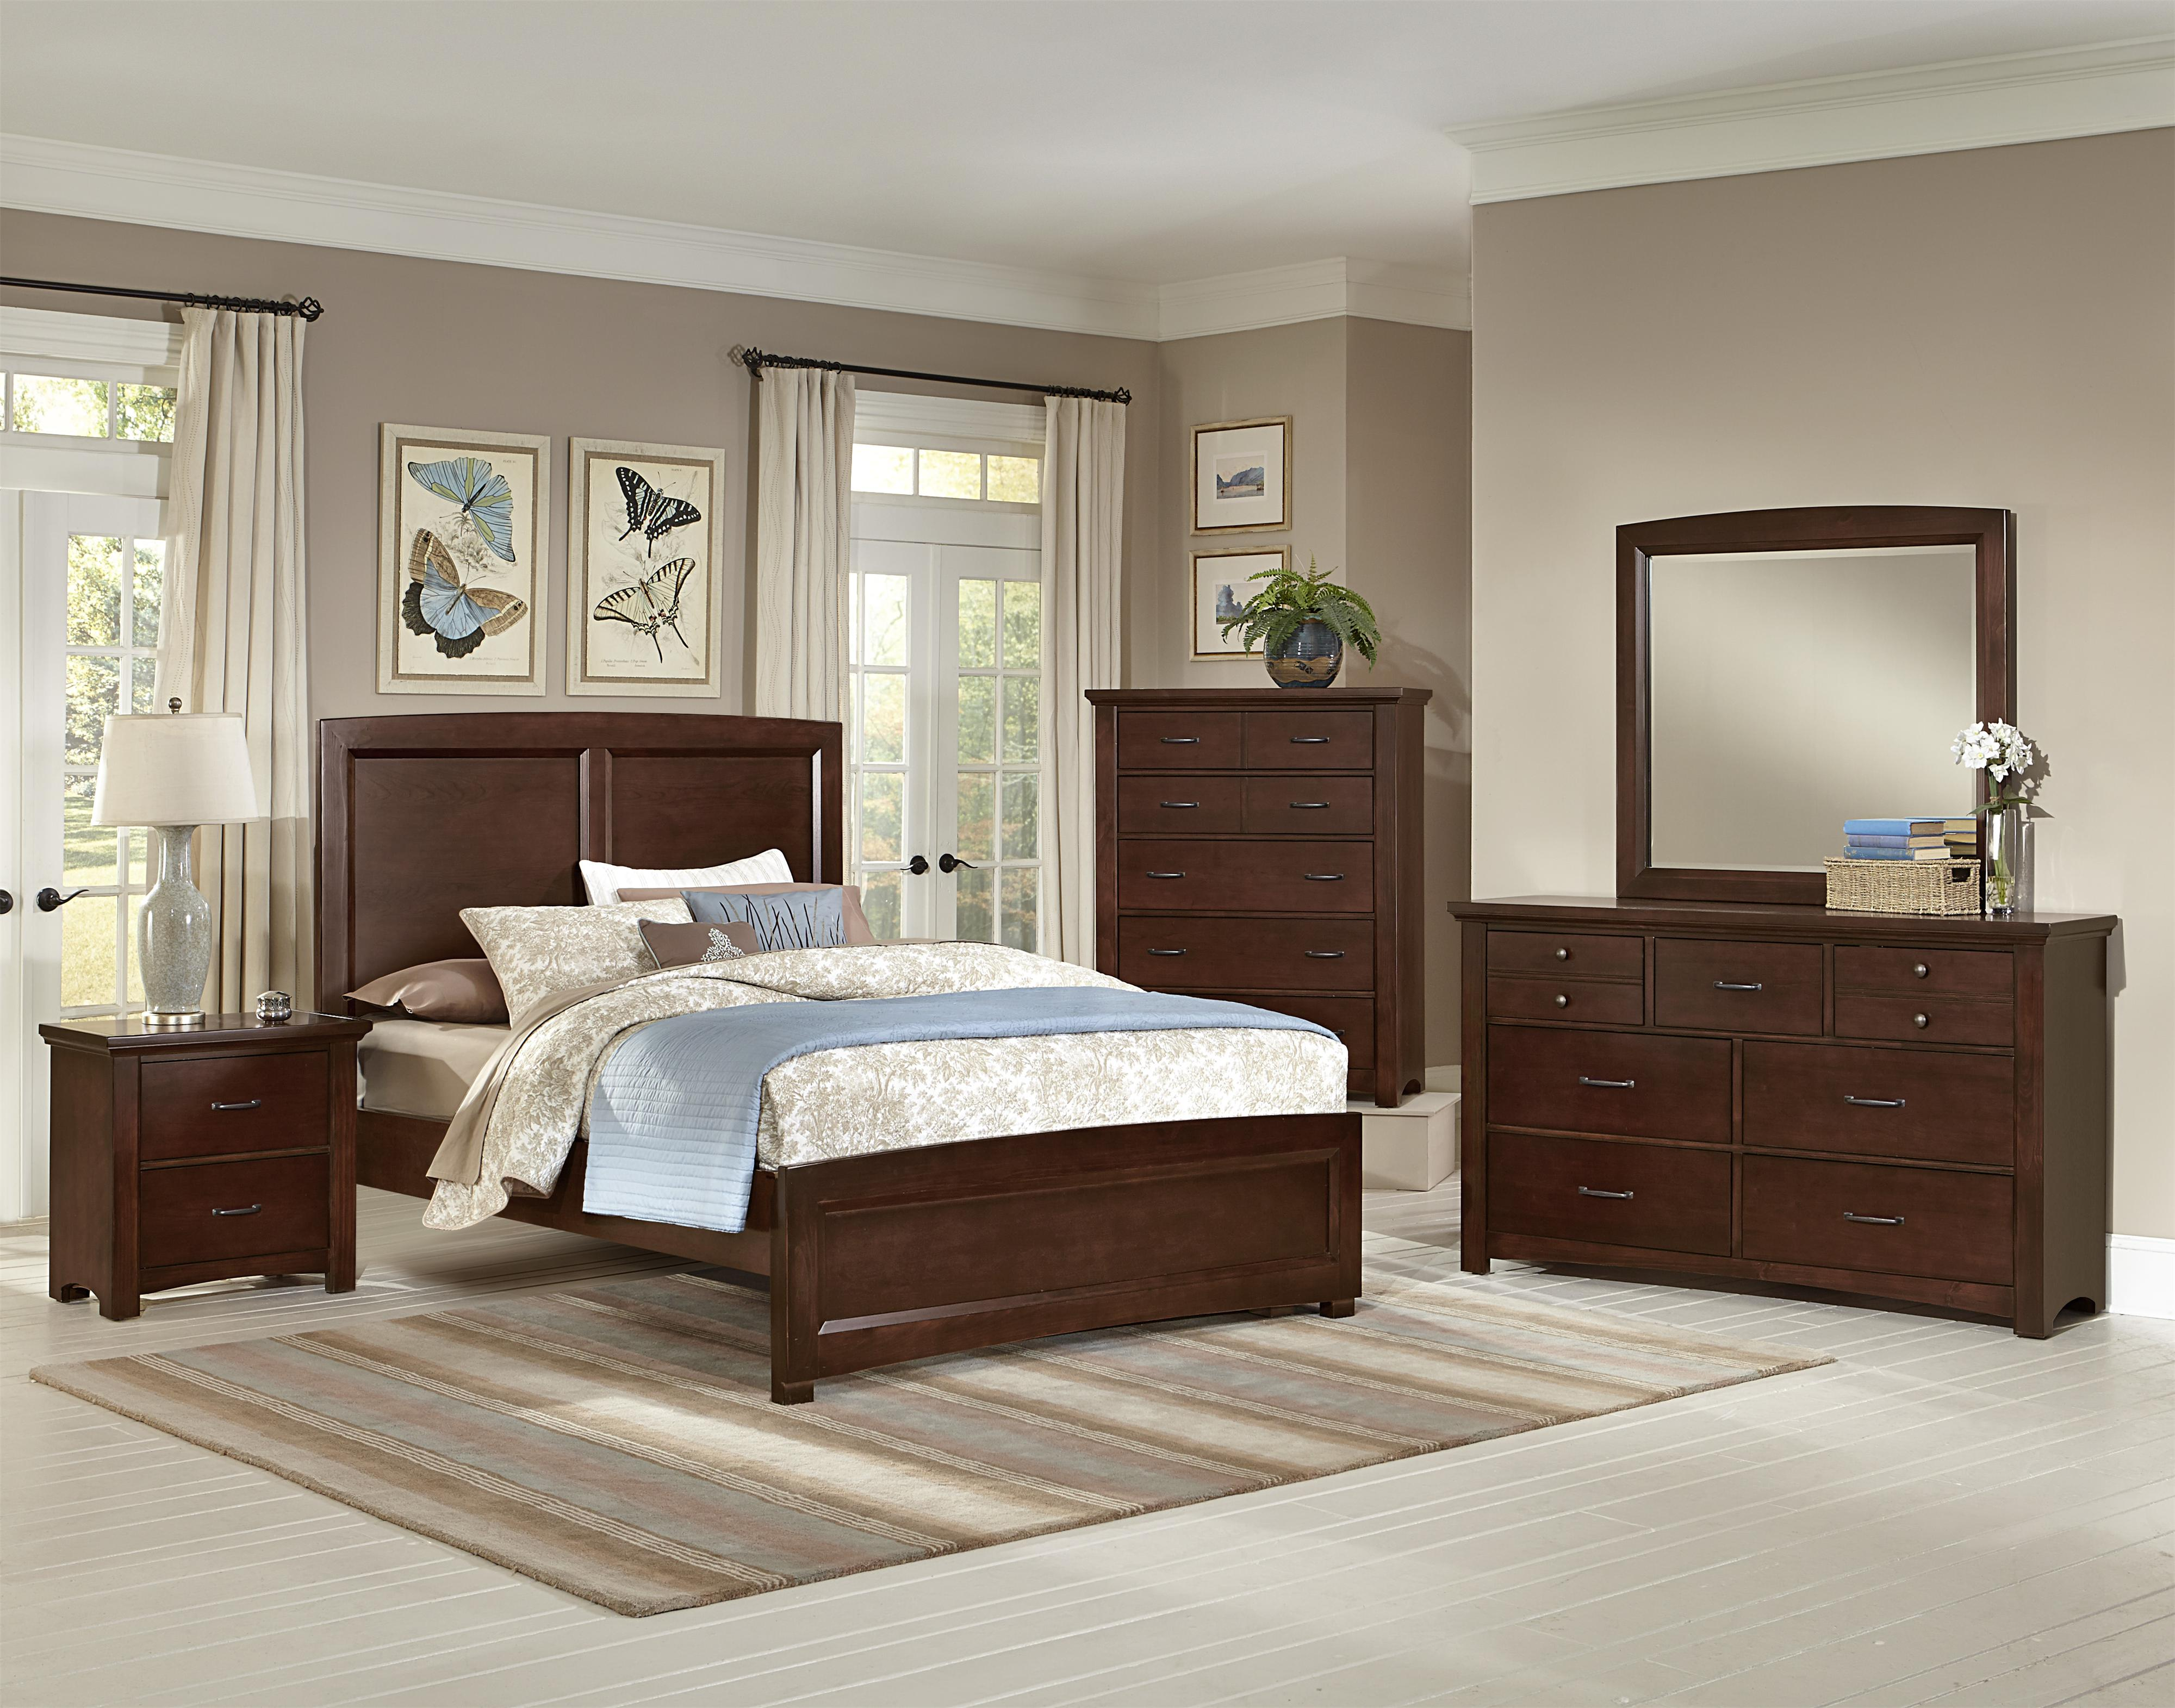 bassett bedroom sets. Vaughan Bassett Transitions Queen Bedroom Group  Colder s Furniture and Appliance Groups